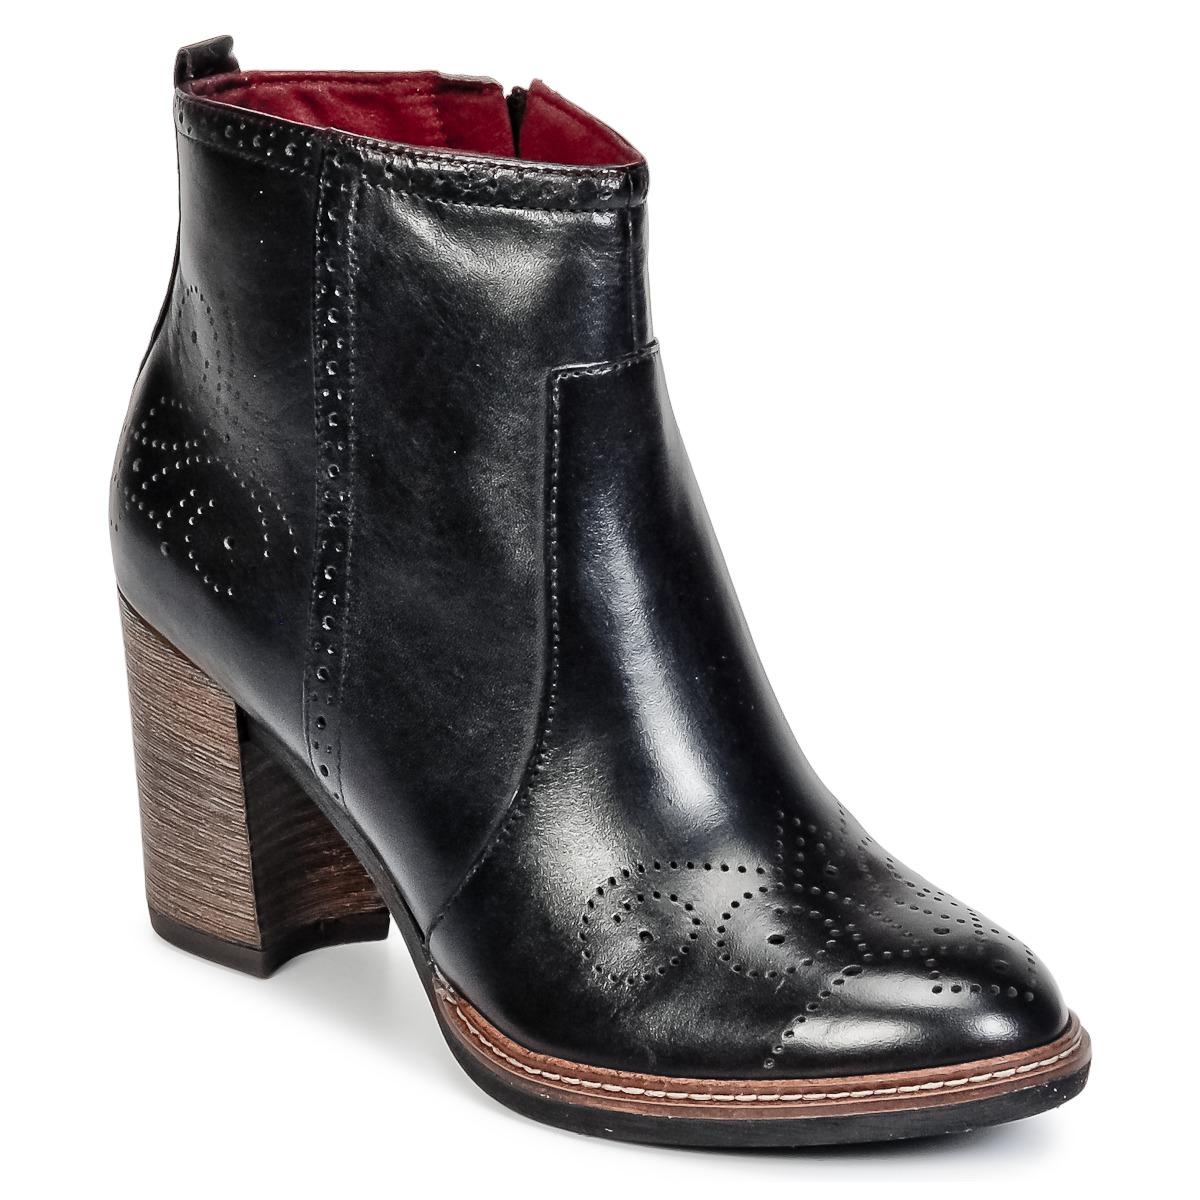 tamaris kolyma noir chaussure pas cher avec chaussures bottines femme 70 00. Black Bedroom Furniture Sets. Home Design Ideas